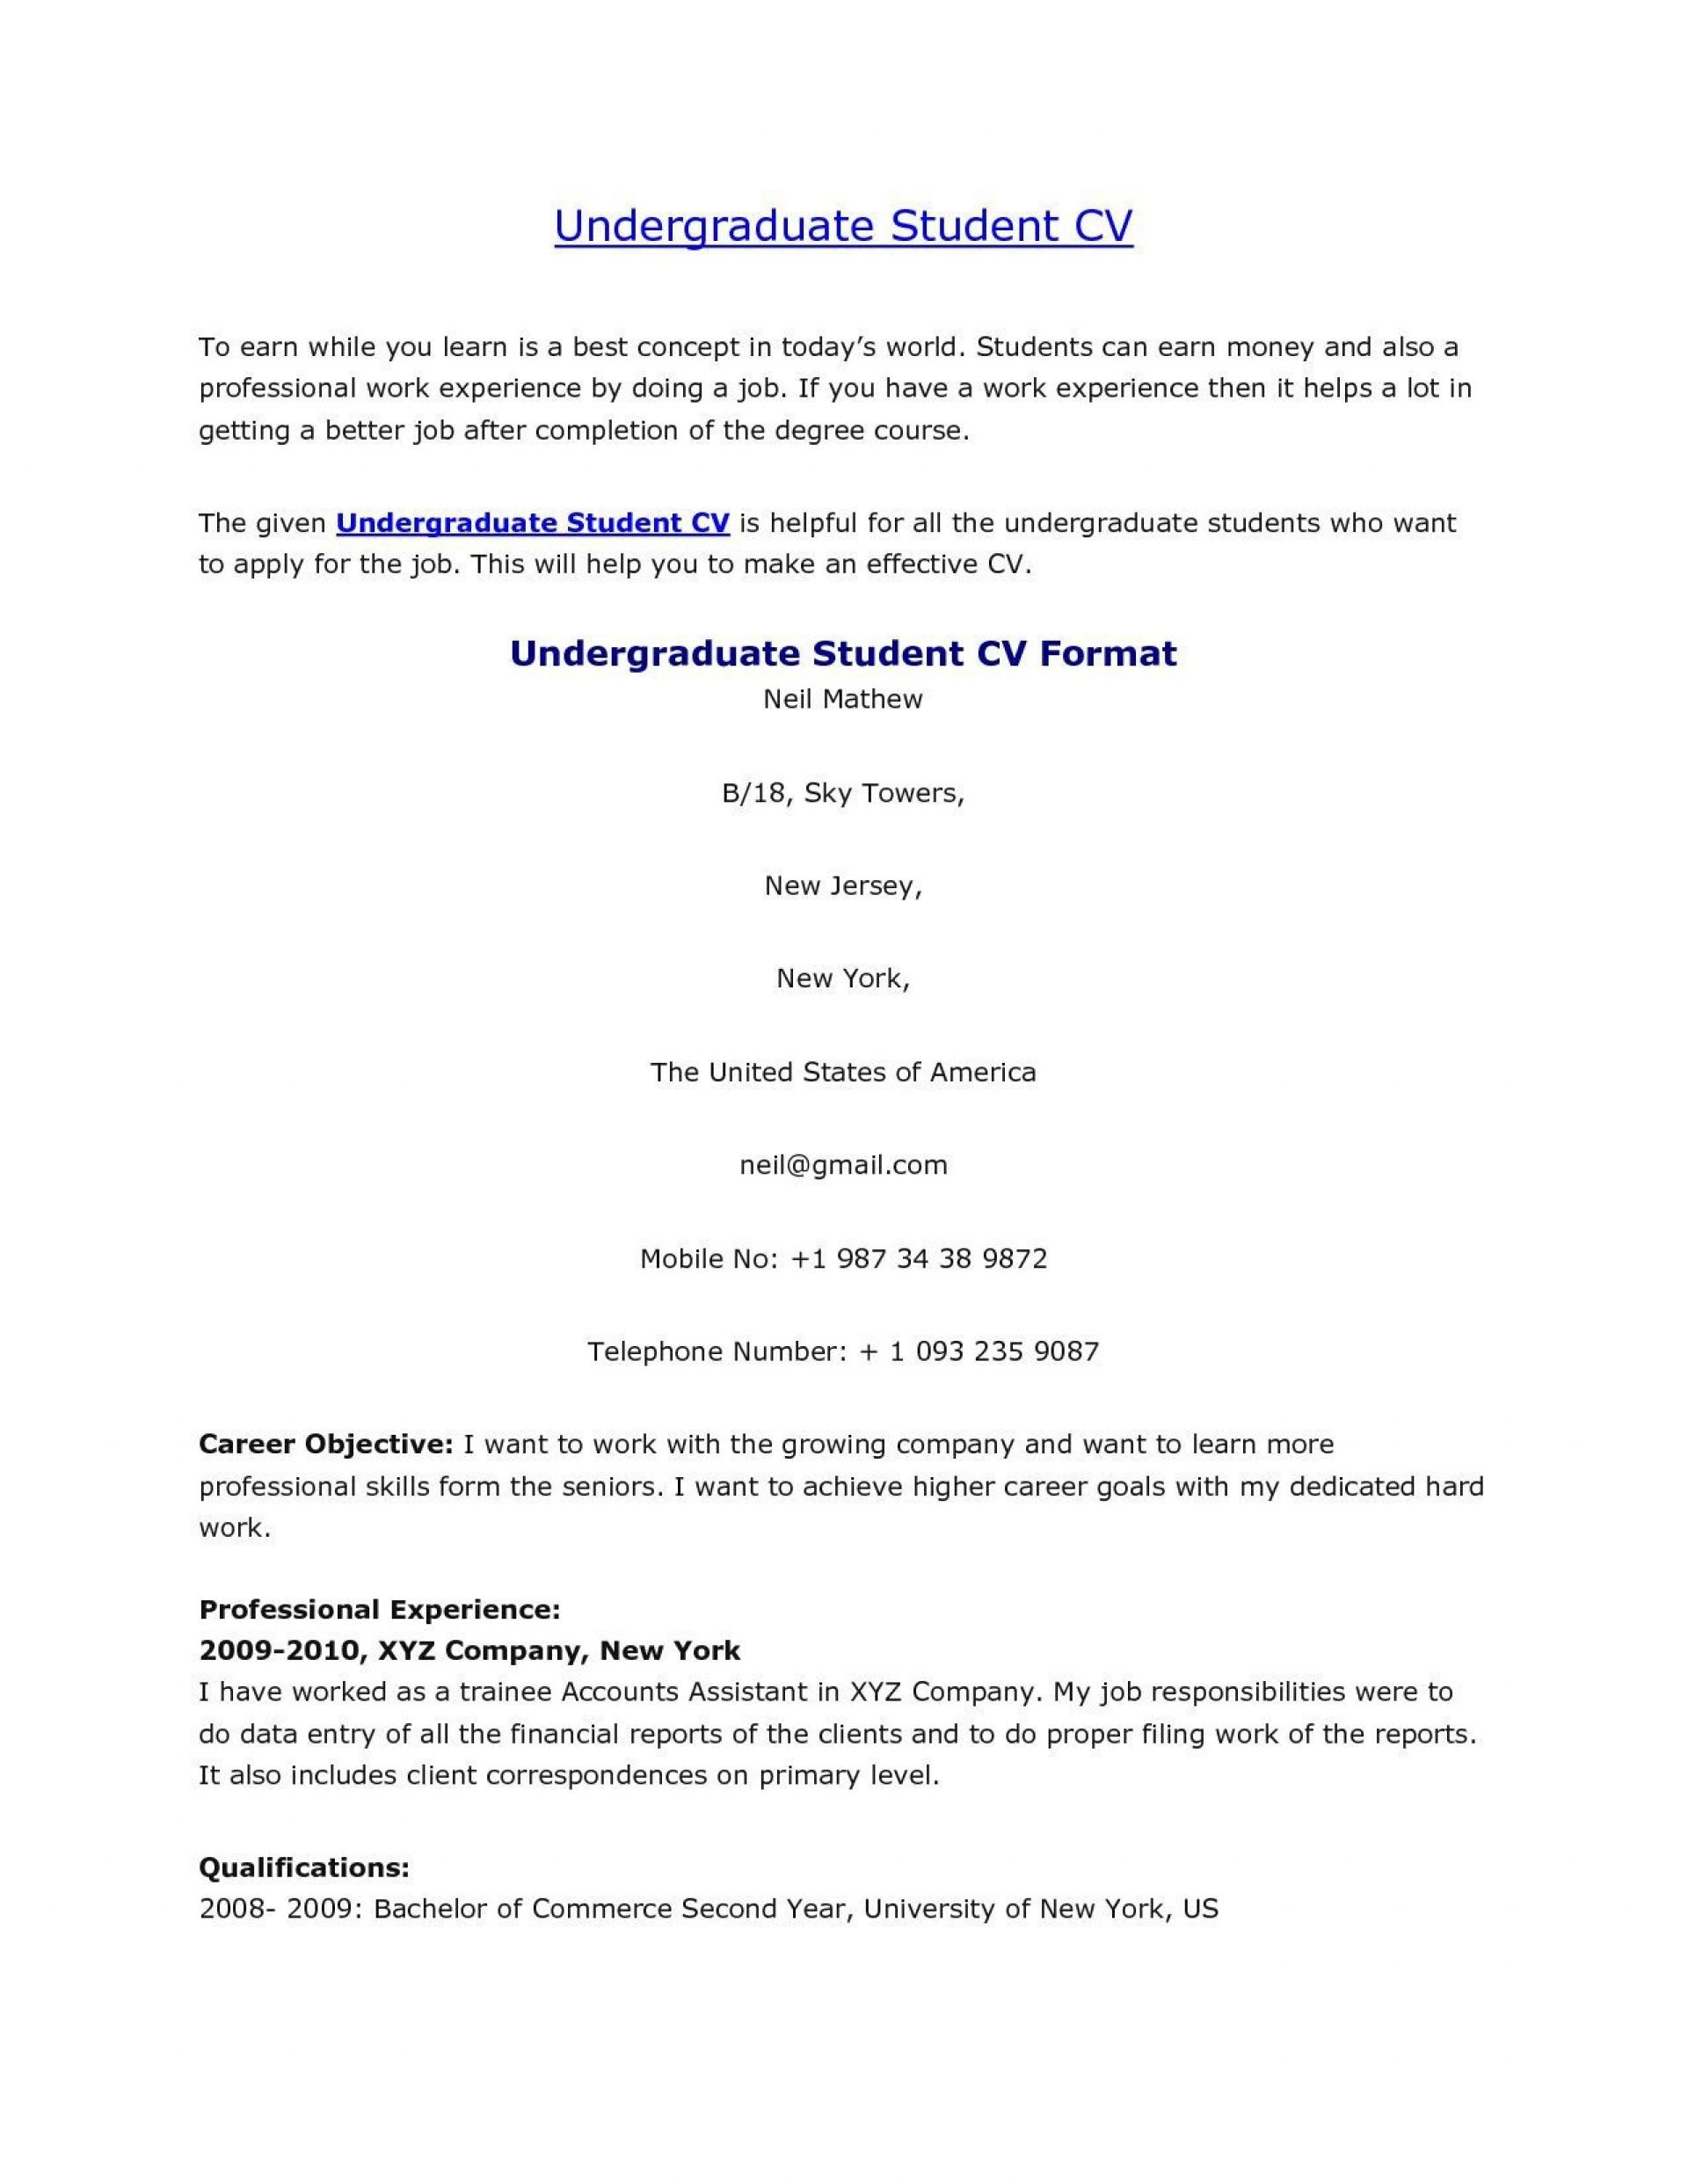 004 Rare Undergraduate Student Cv Template Sample  Pdf Download1920